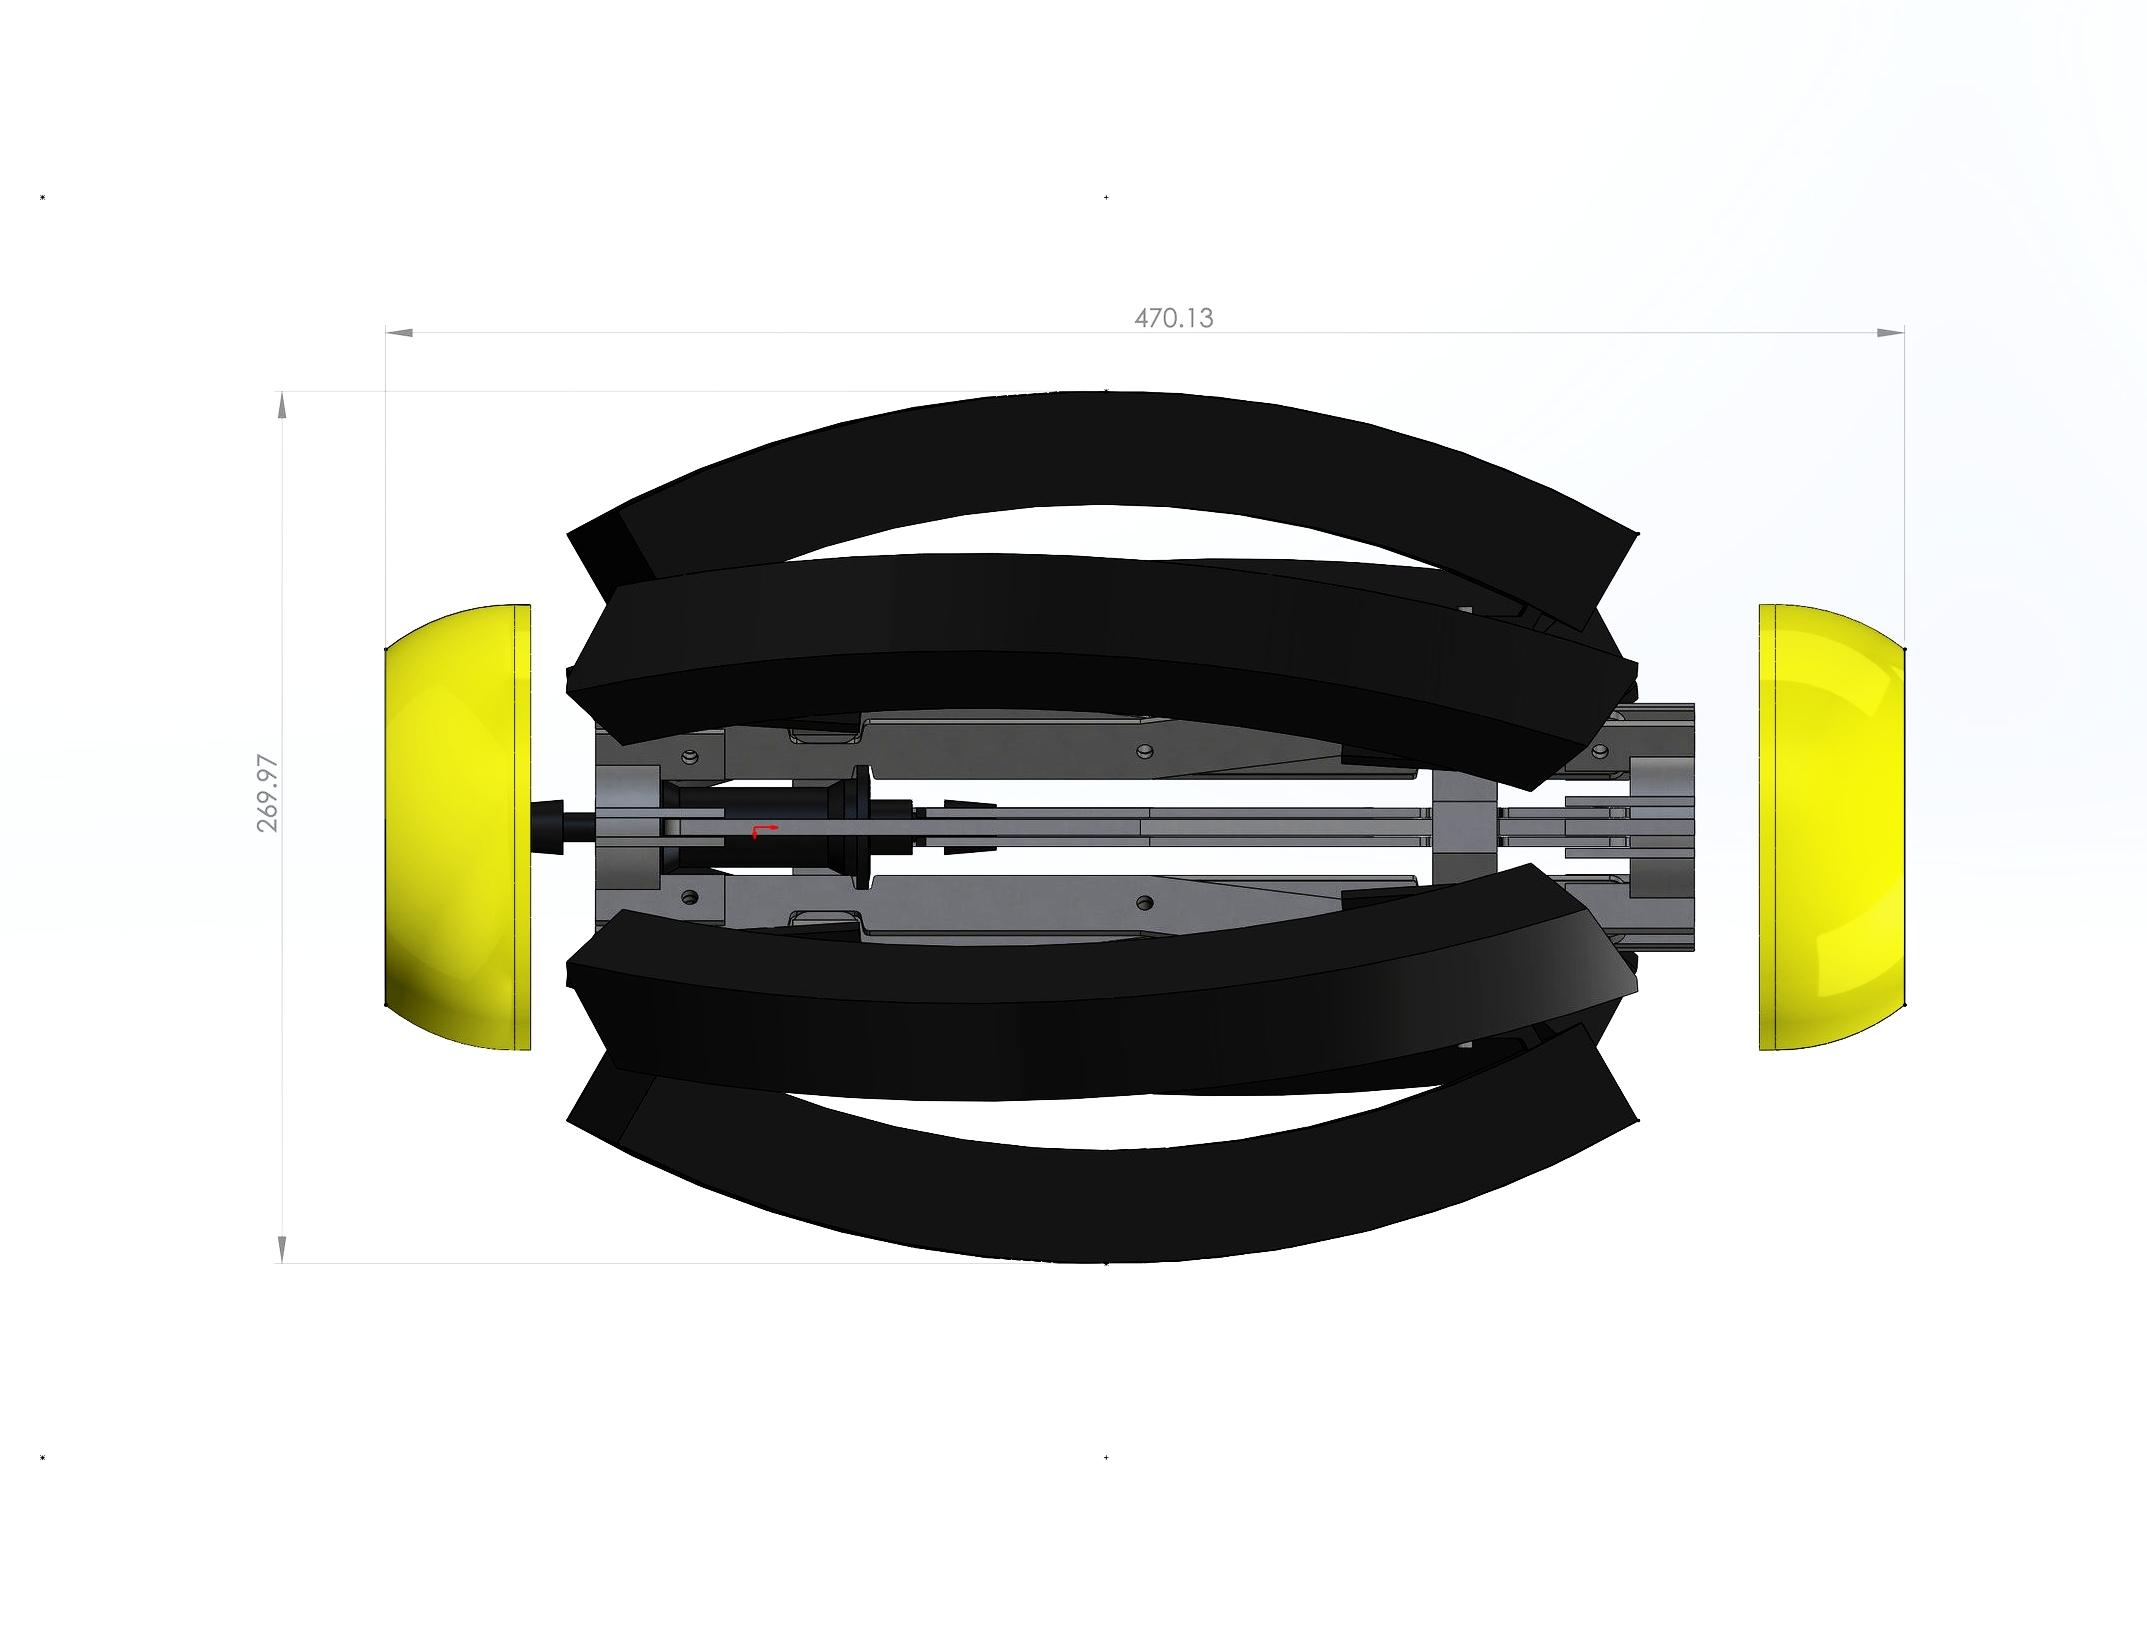 REVOLVE_3D wheel_design development_Andrea Mocellin